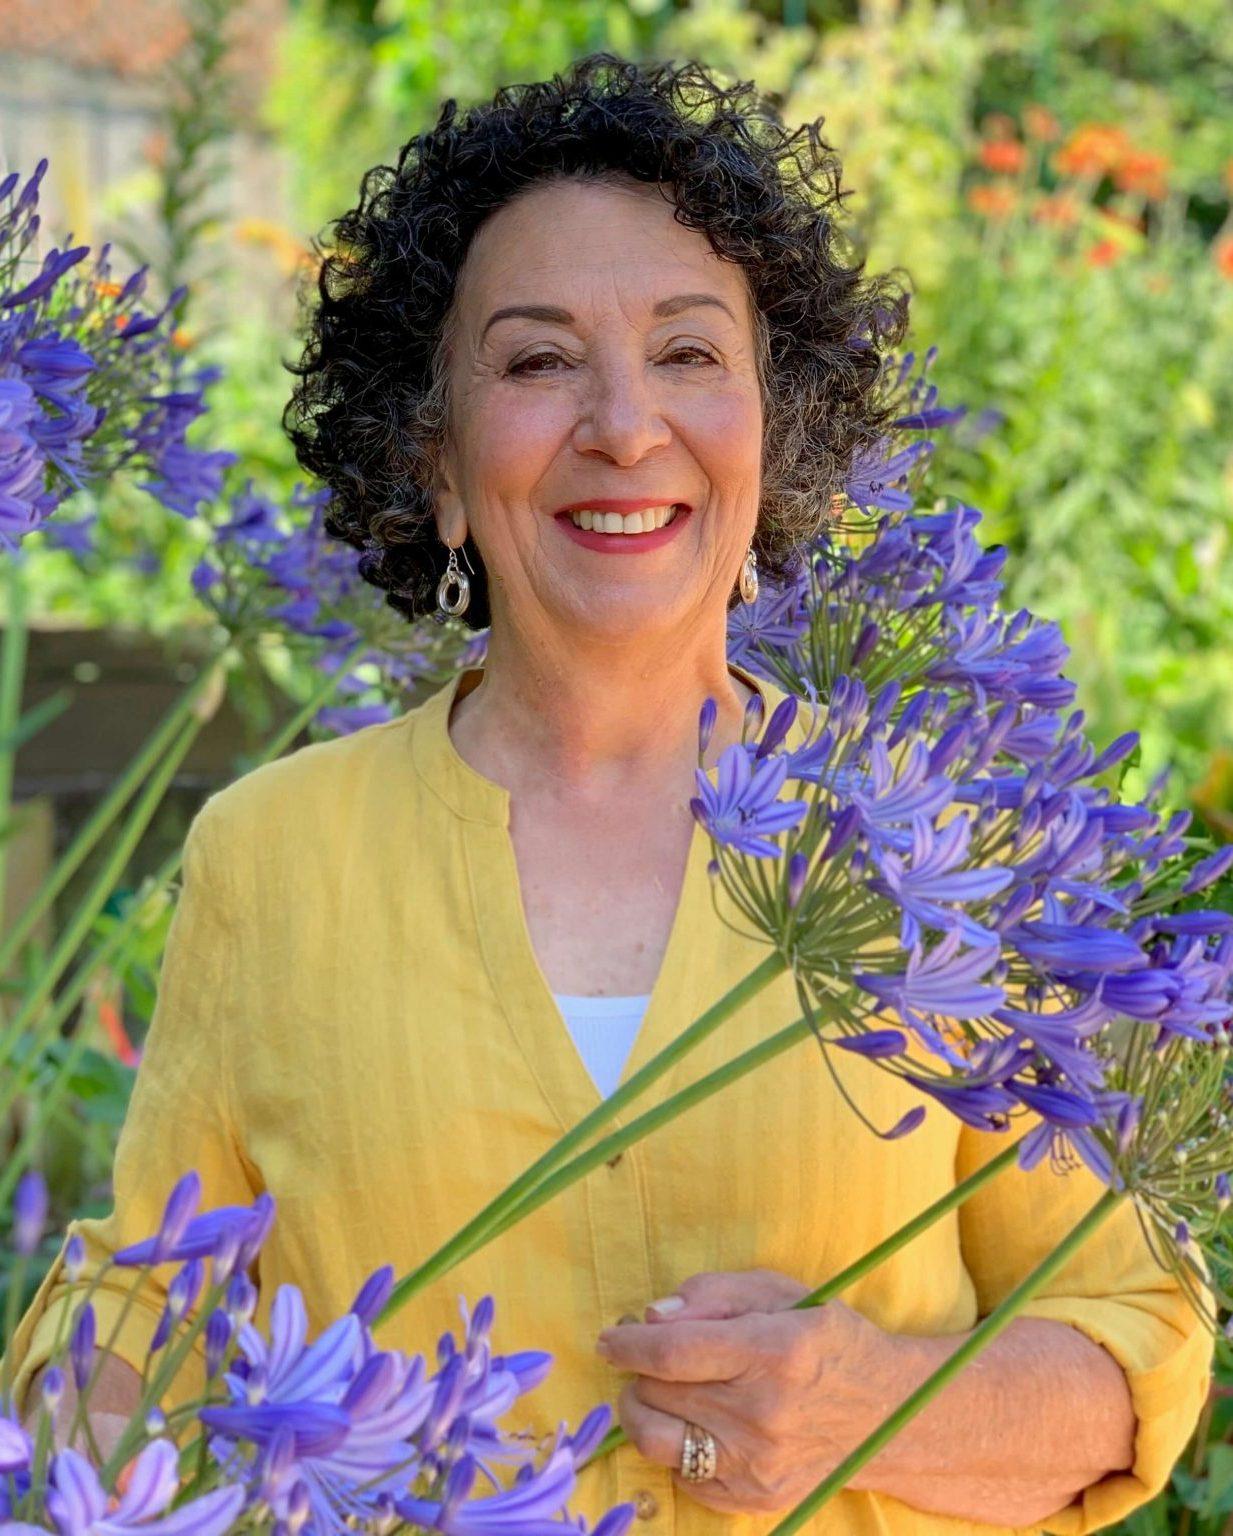 Author and Speaker and Gardener Toni Gattone